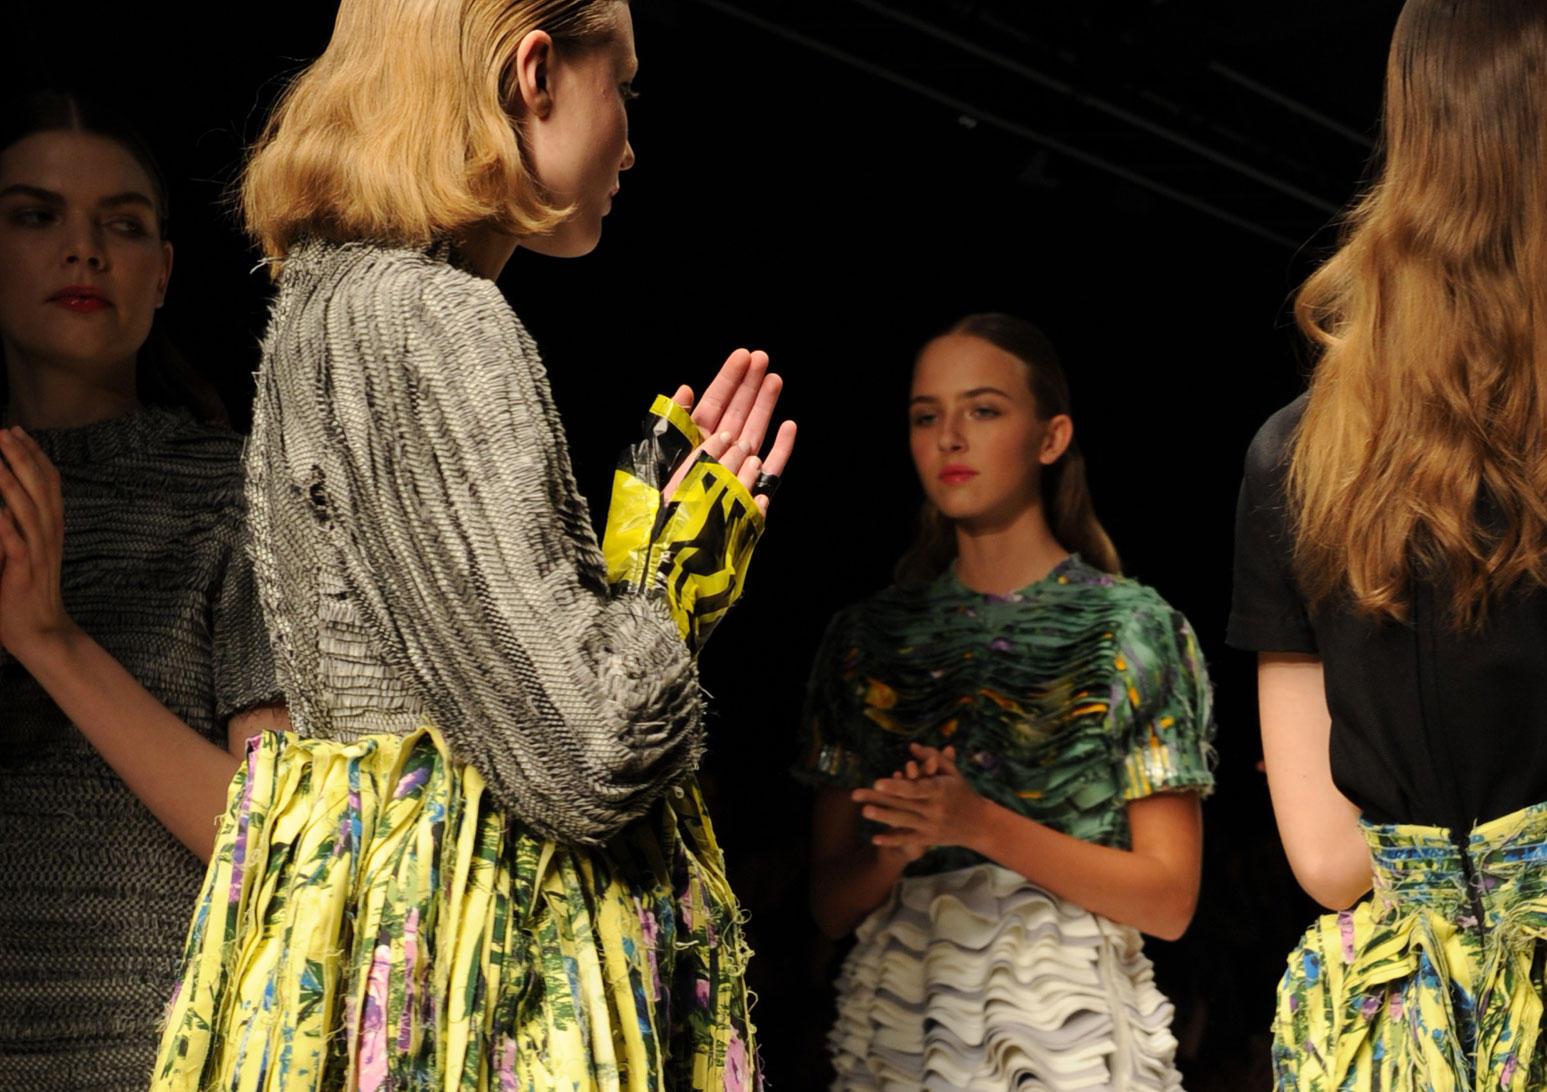 eddy anemian, stockholm fashion week, stockholm, billur saatci, off ne giysem, playlist, deezer, h&m design award